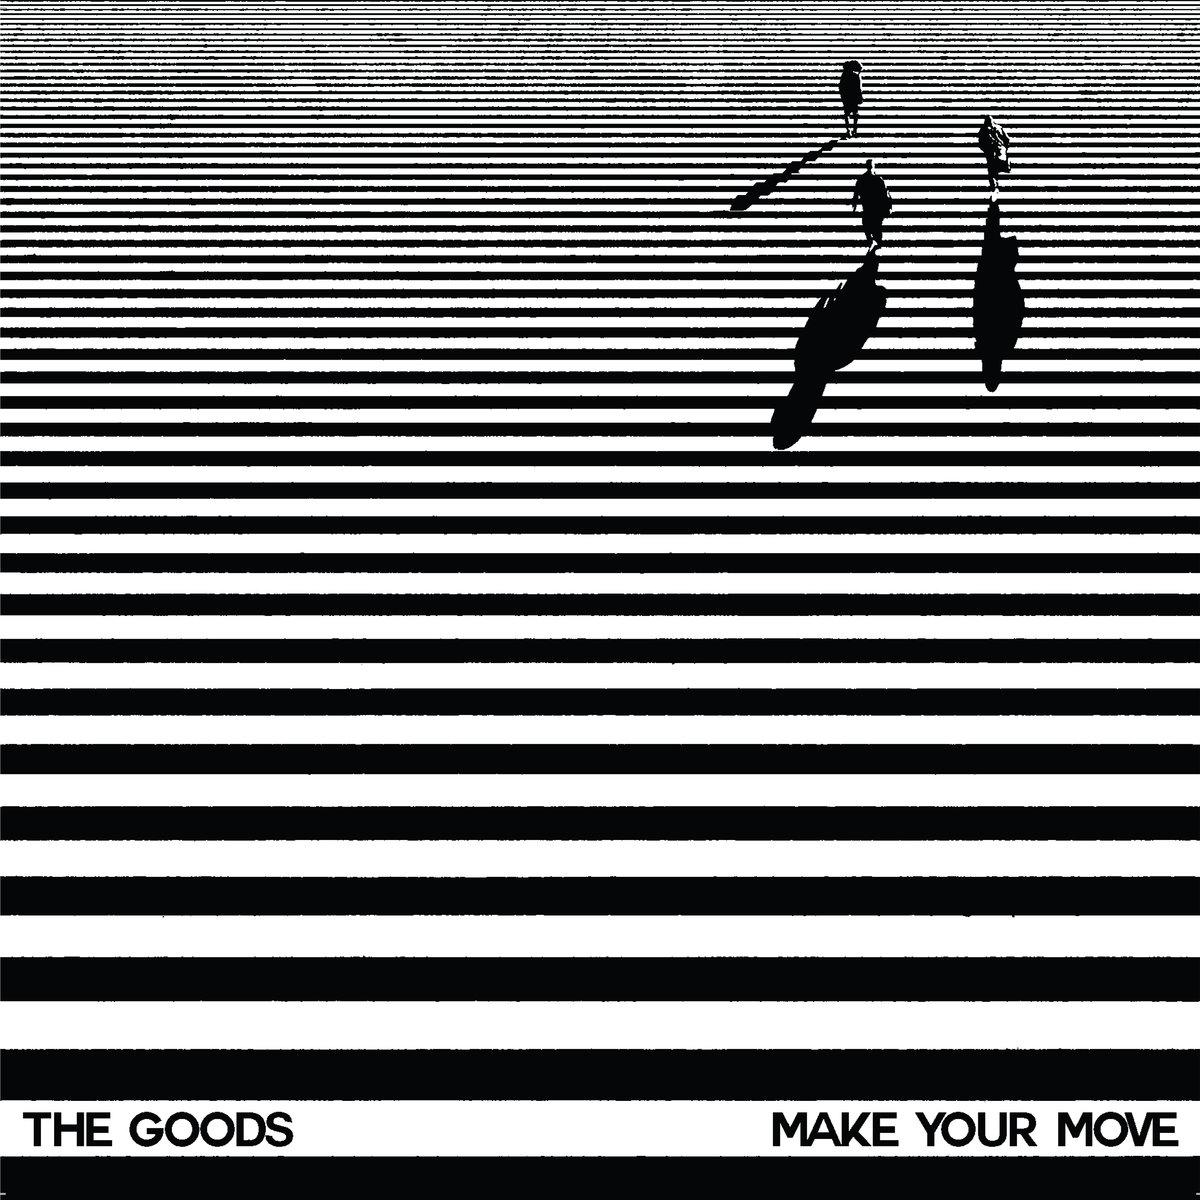 thegoods